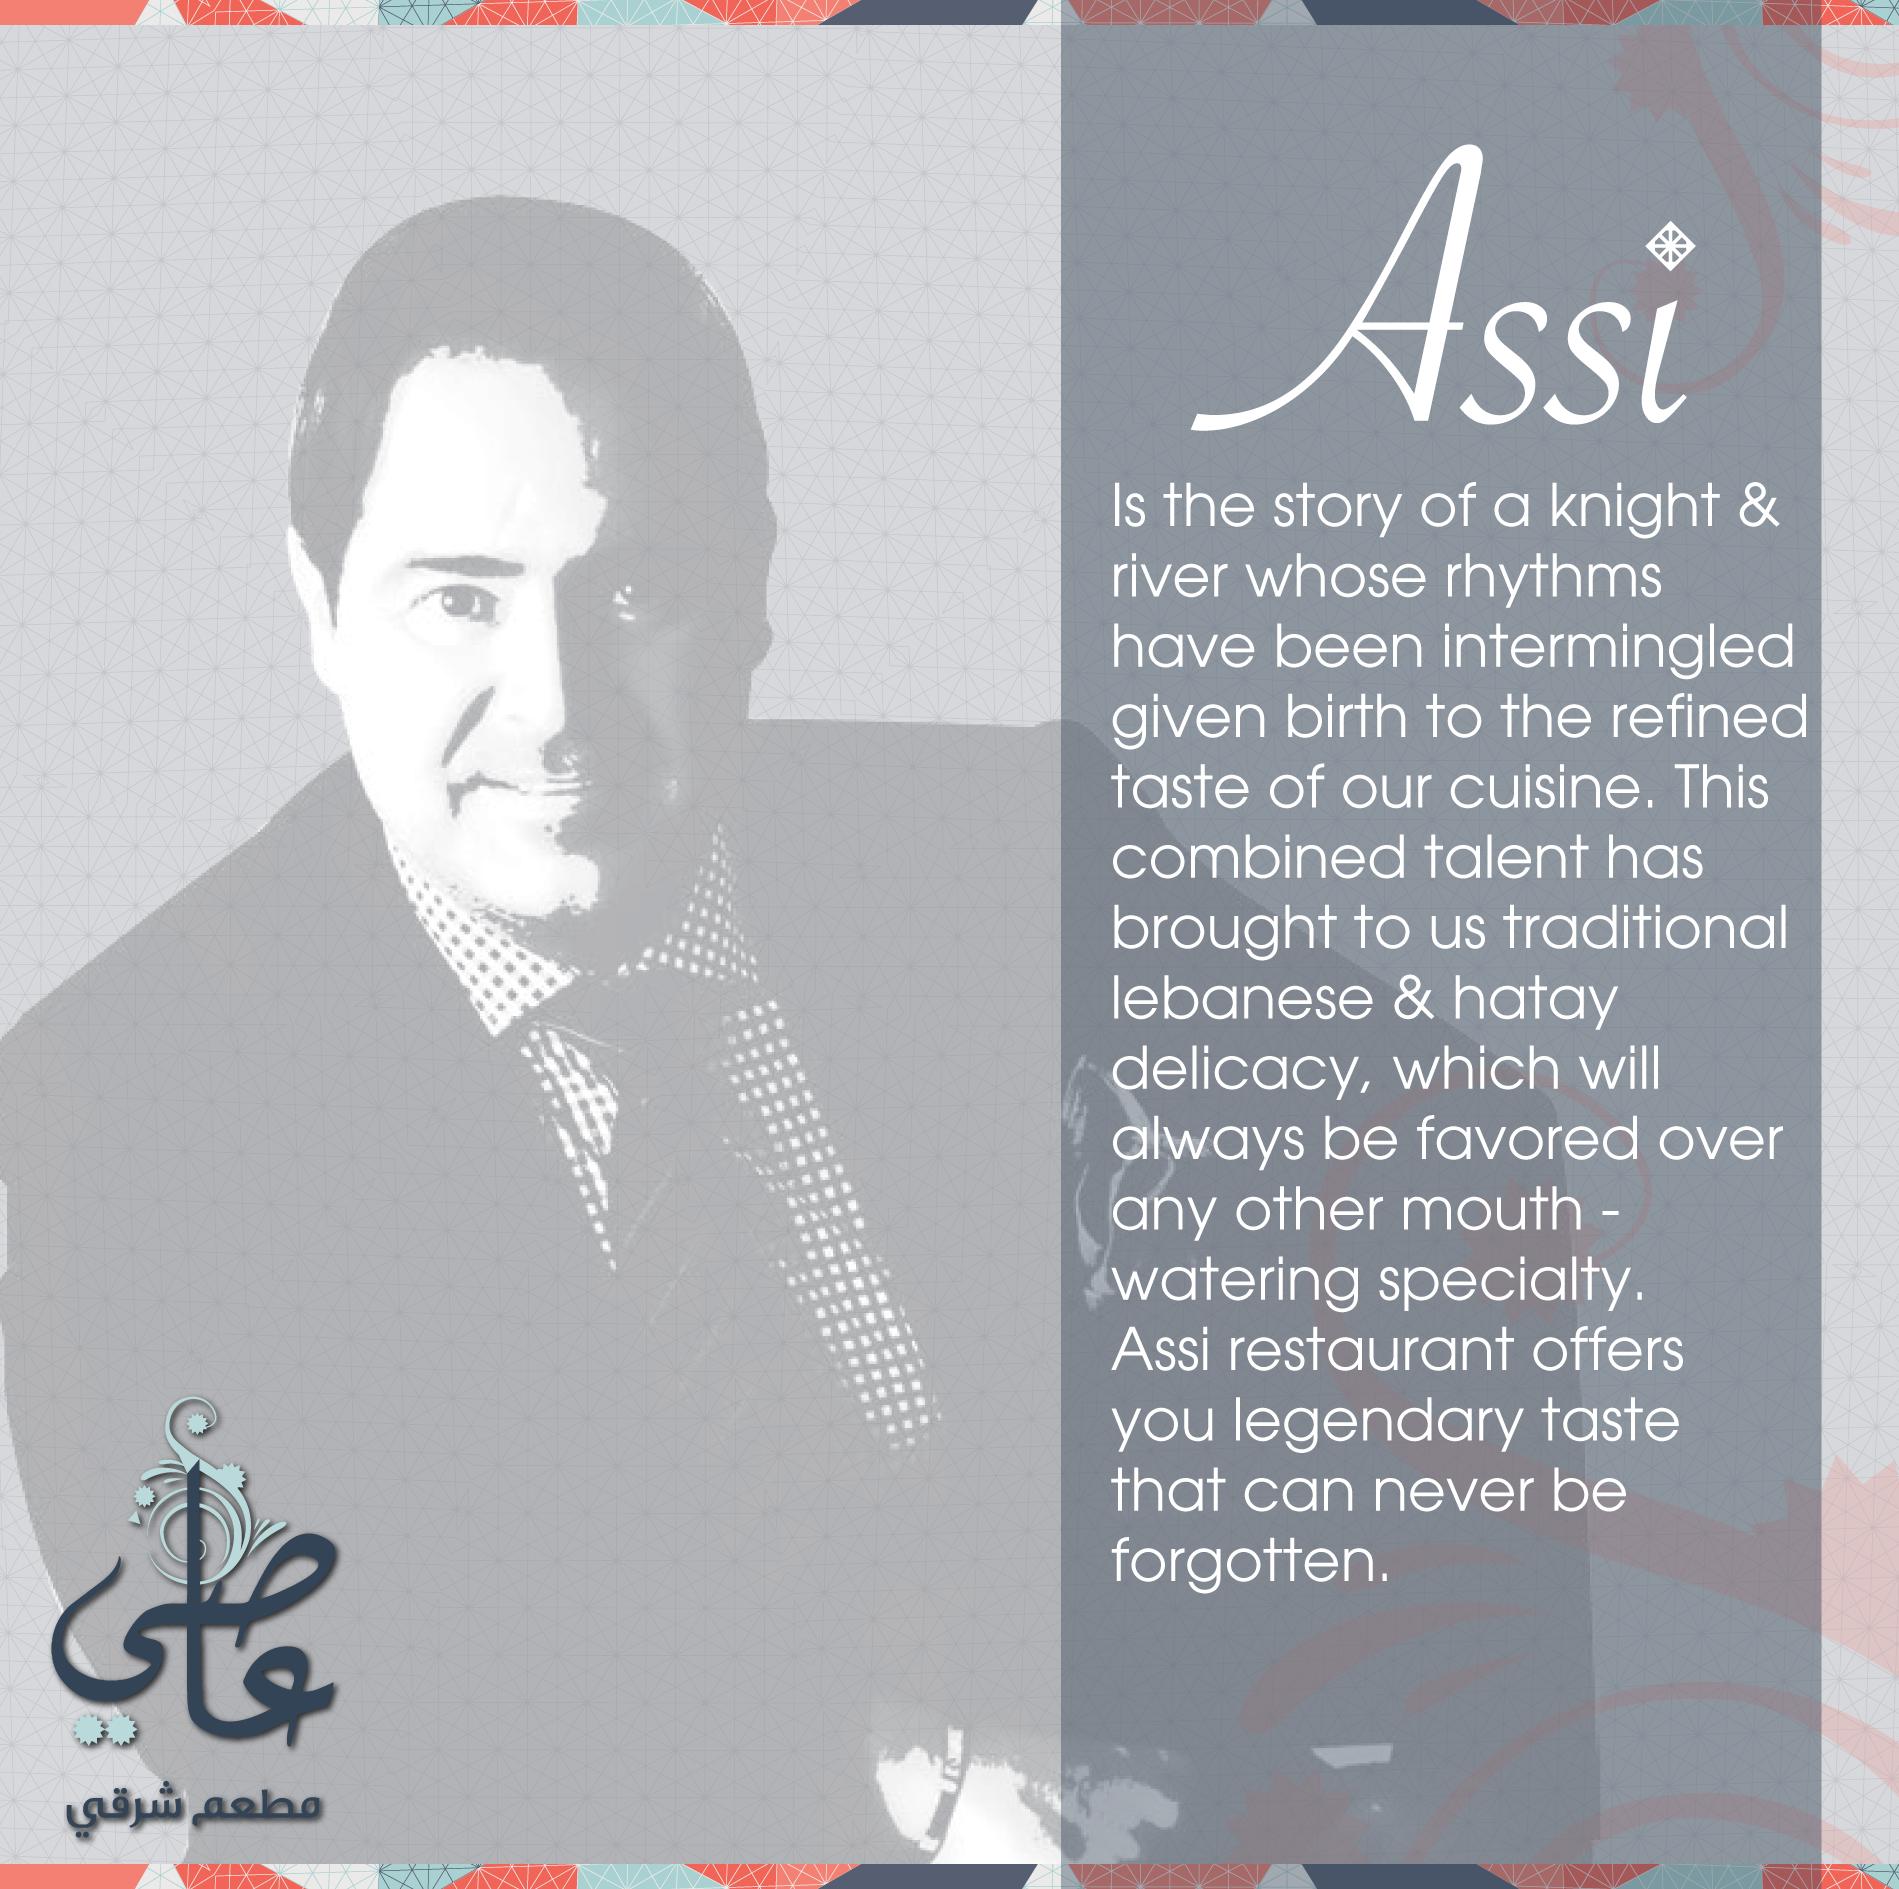 The story of Assi Restaurant #assi #assirestaurant #restaurant ...